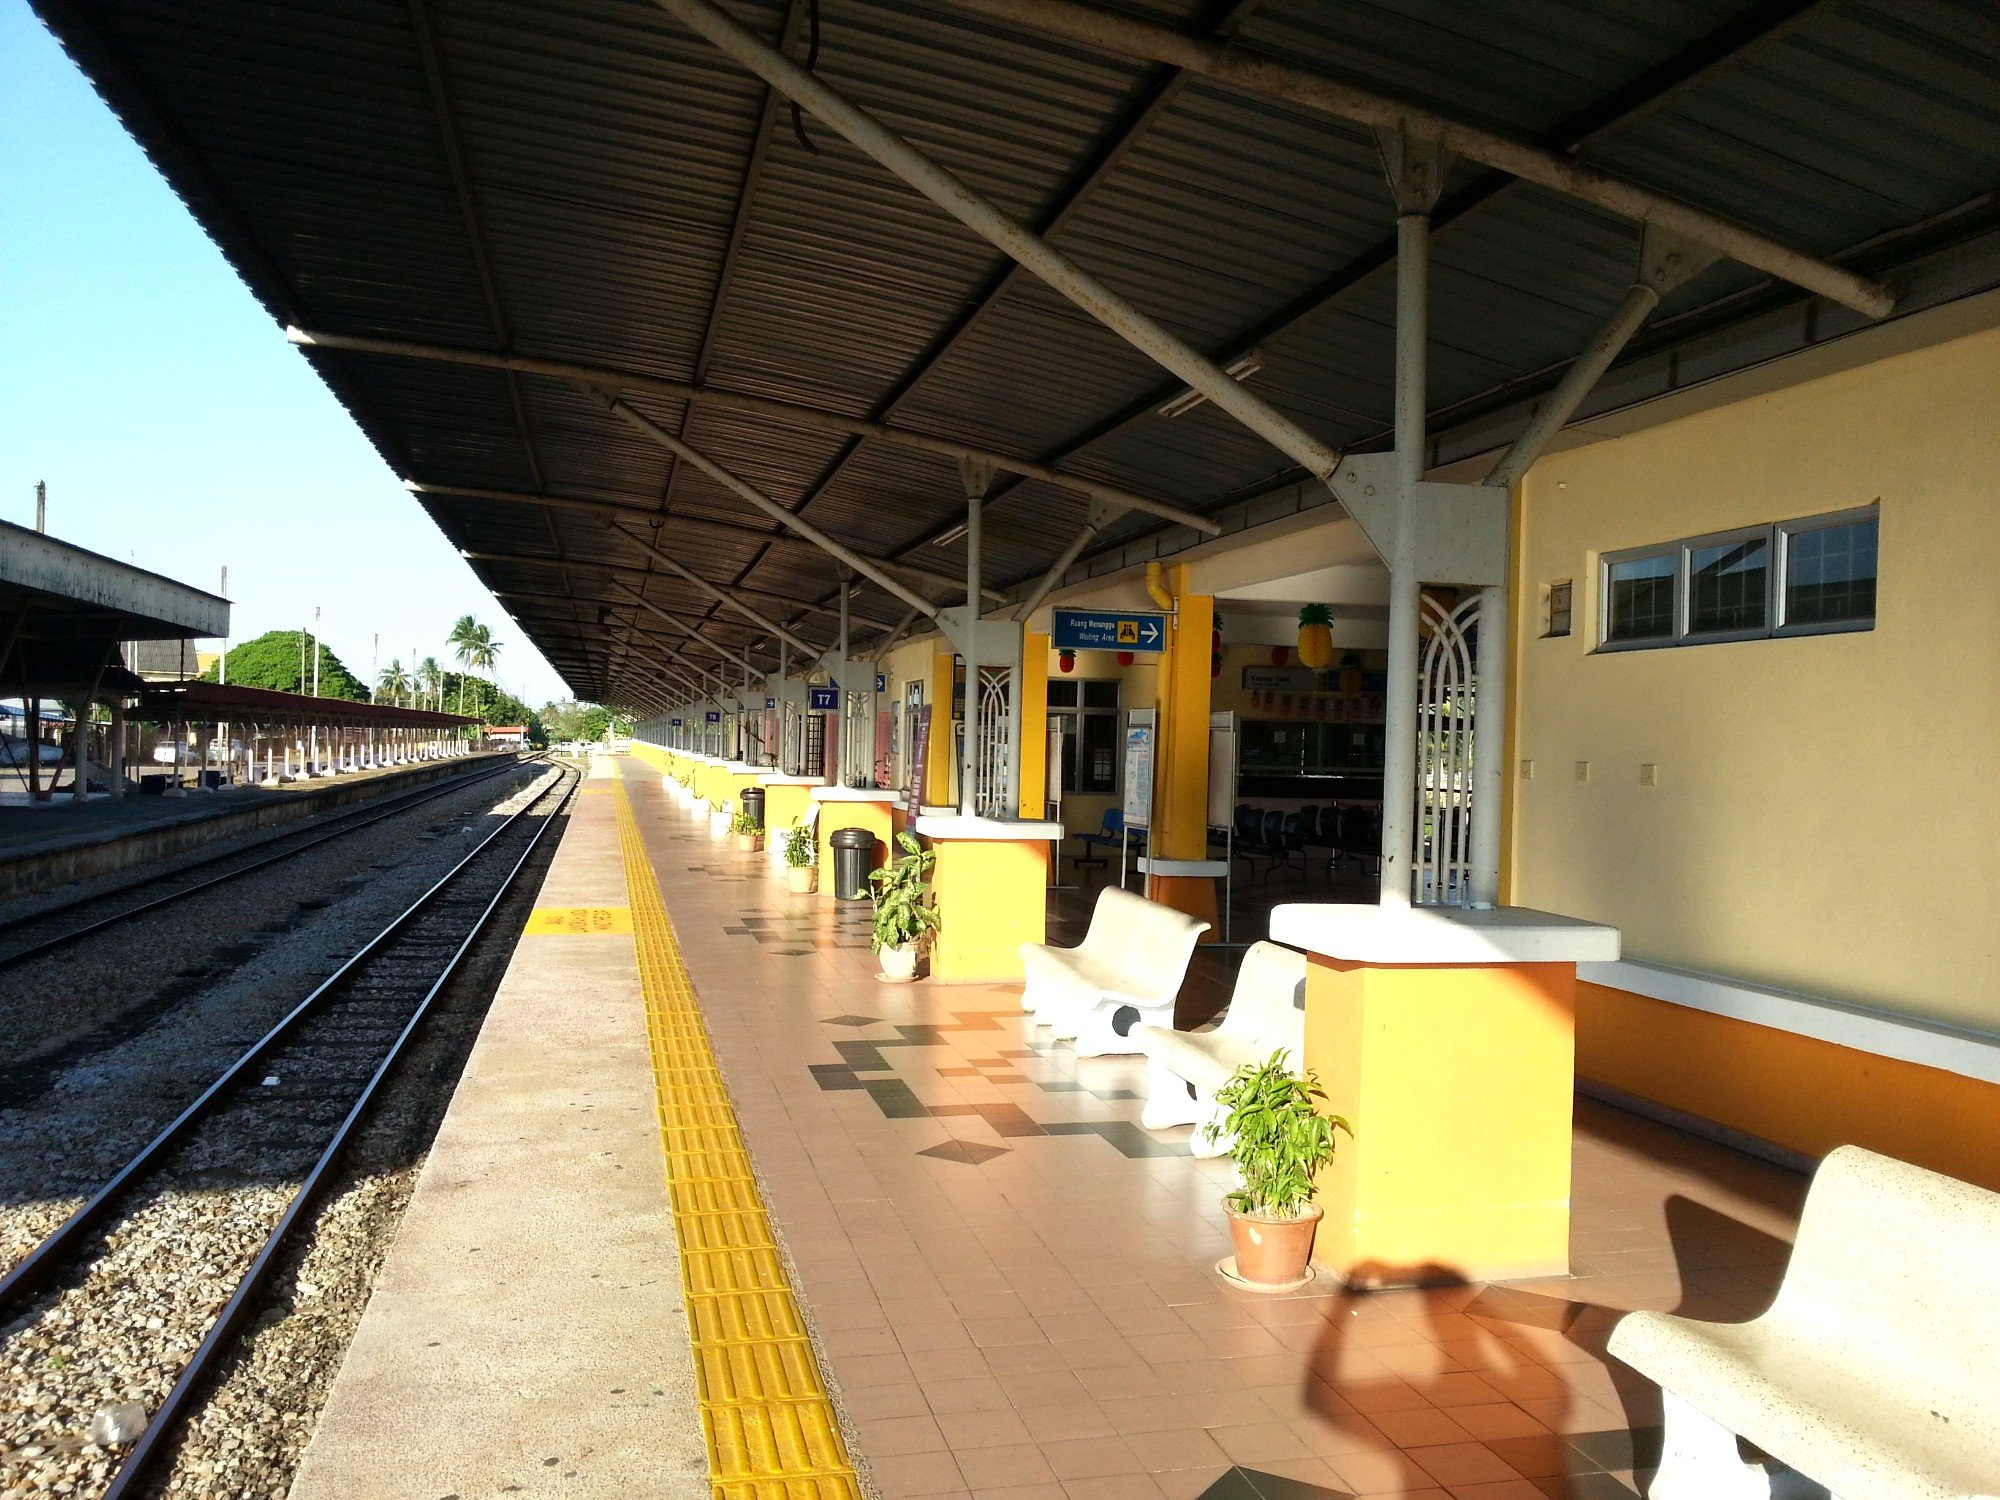 Platform 1 at Wakaf Bharu Railway Station